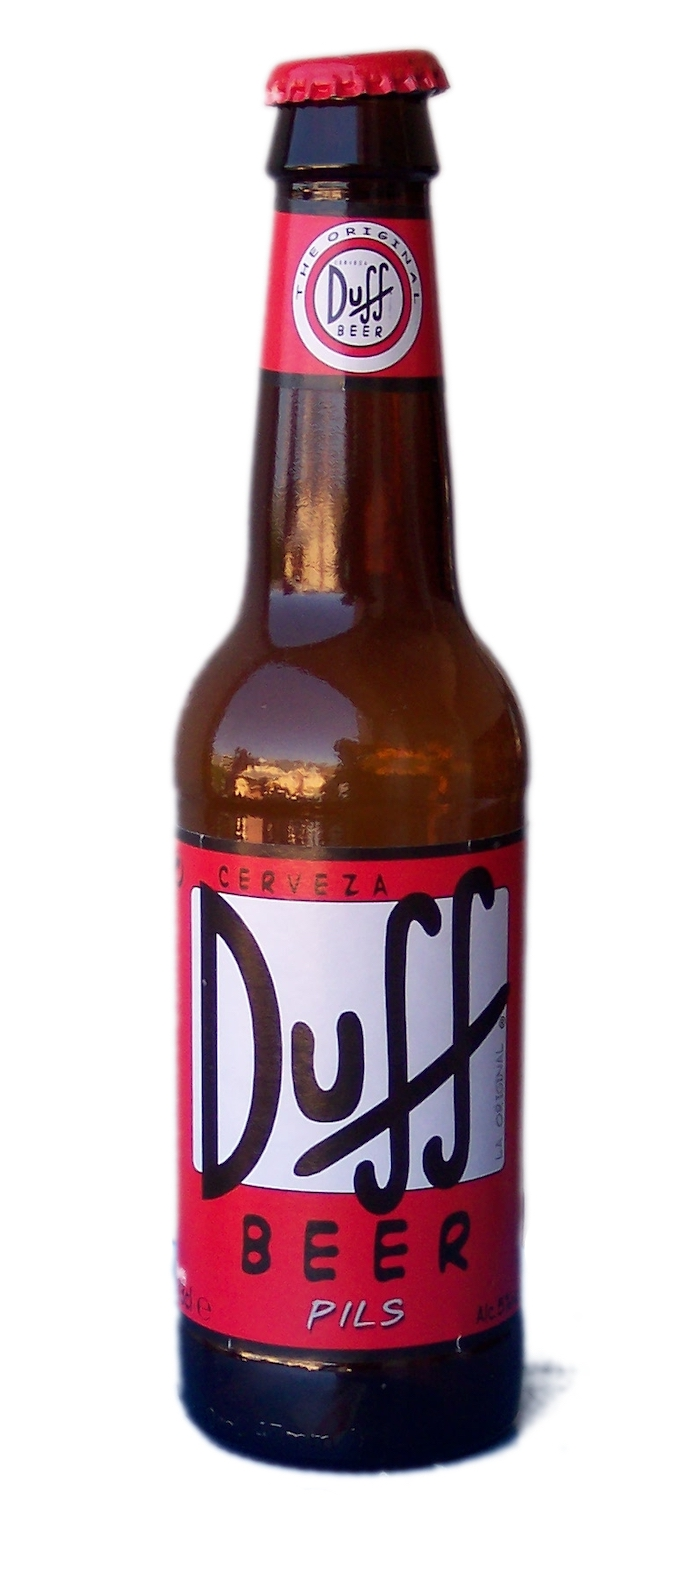 Bière duff - Colloque Ceipi Pop Culture